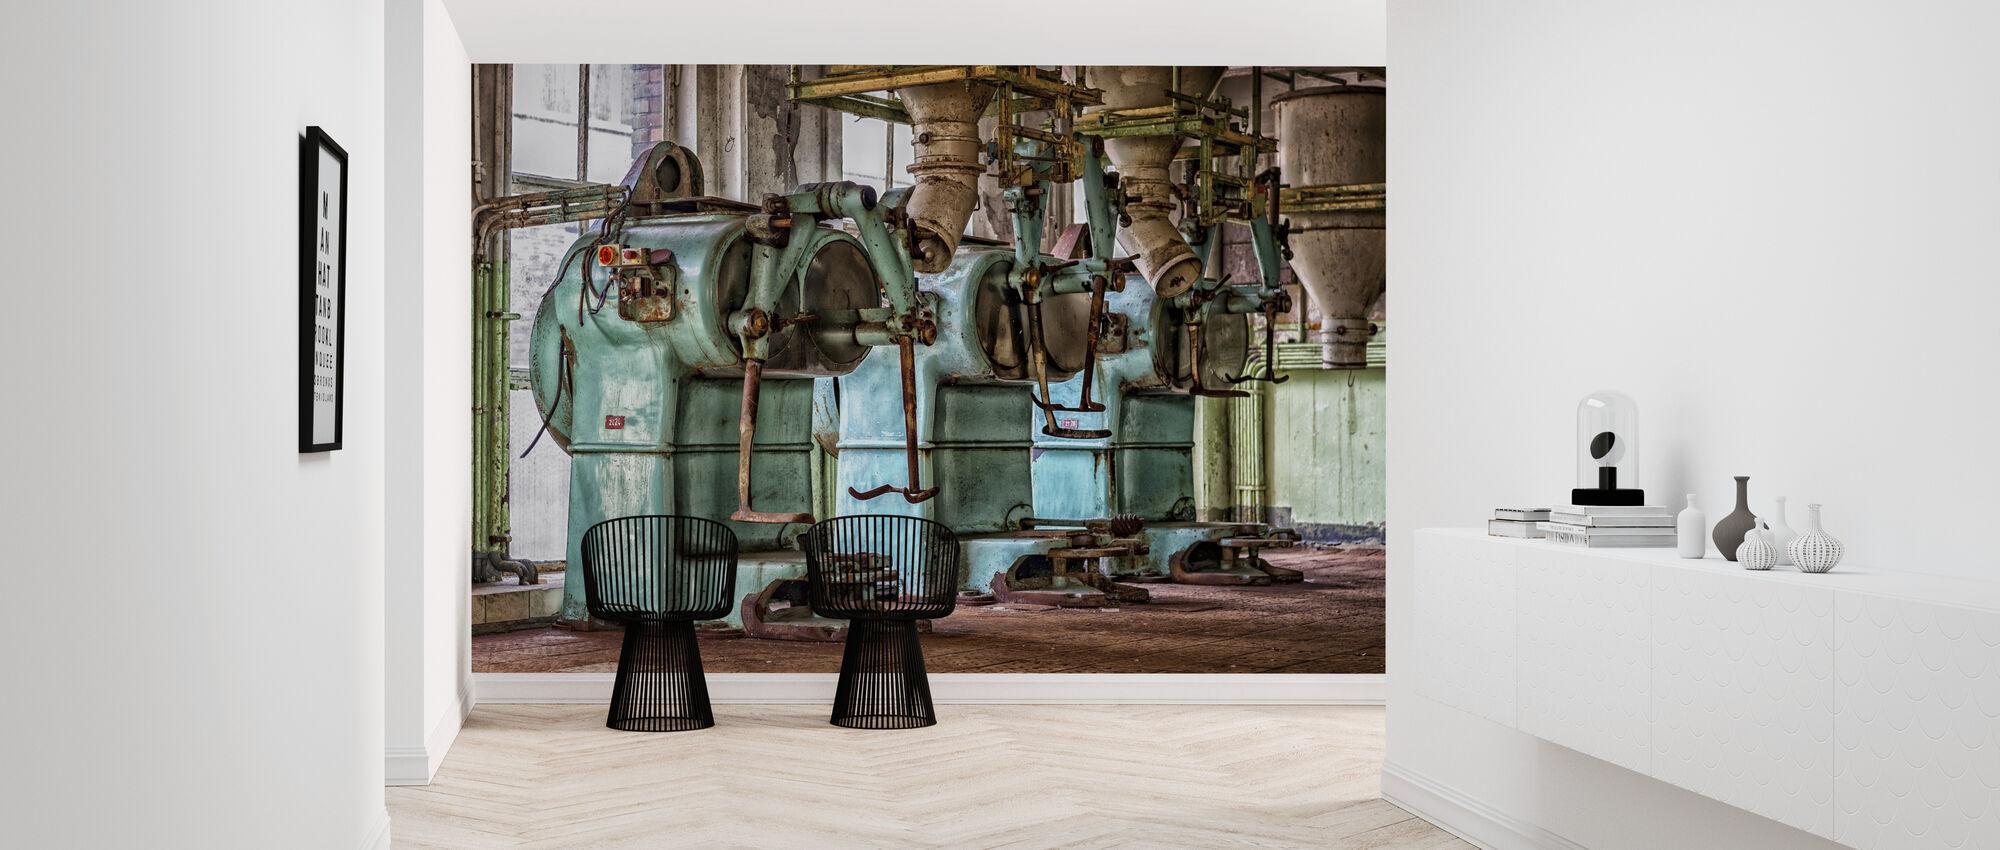 Old Factory Machines - Wallpaper - Hallway